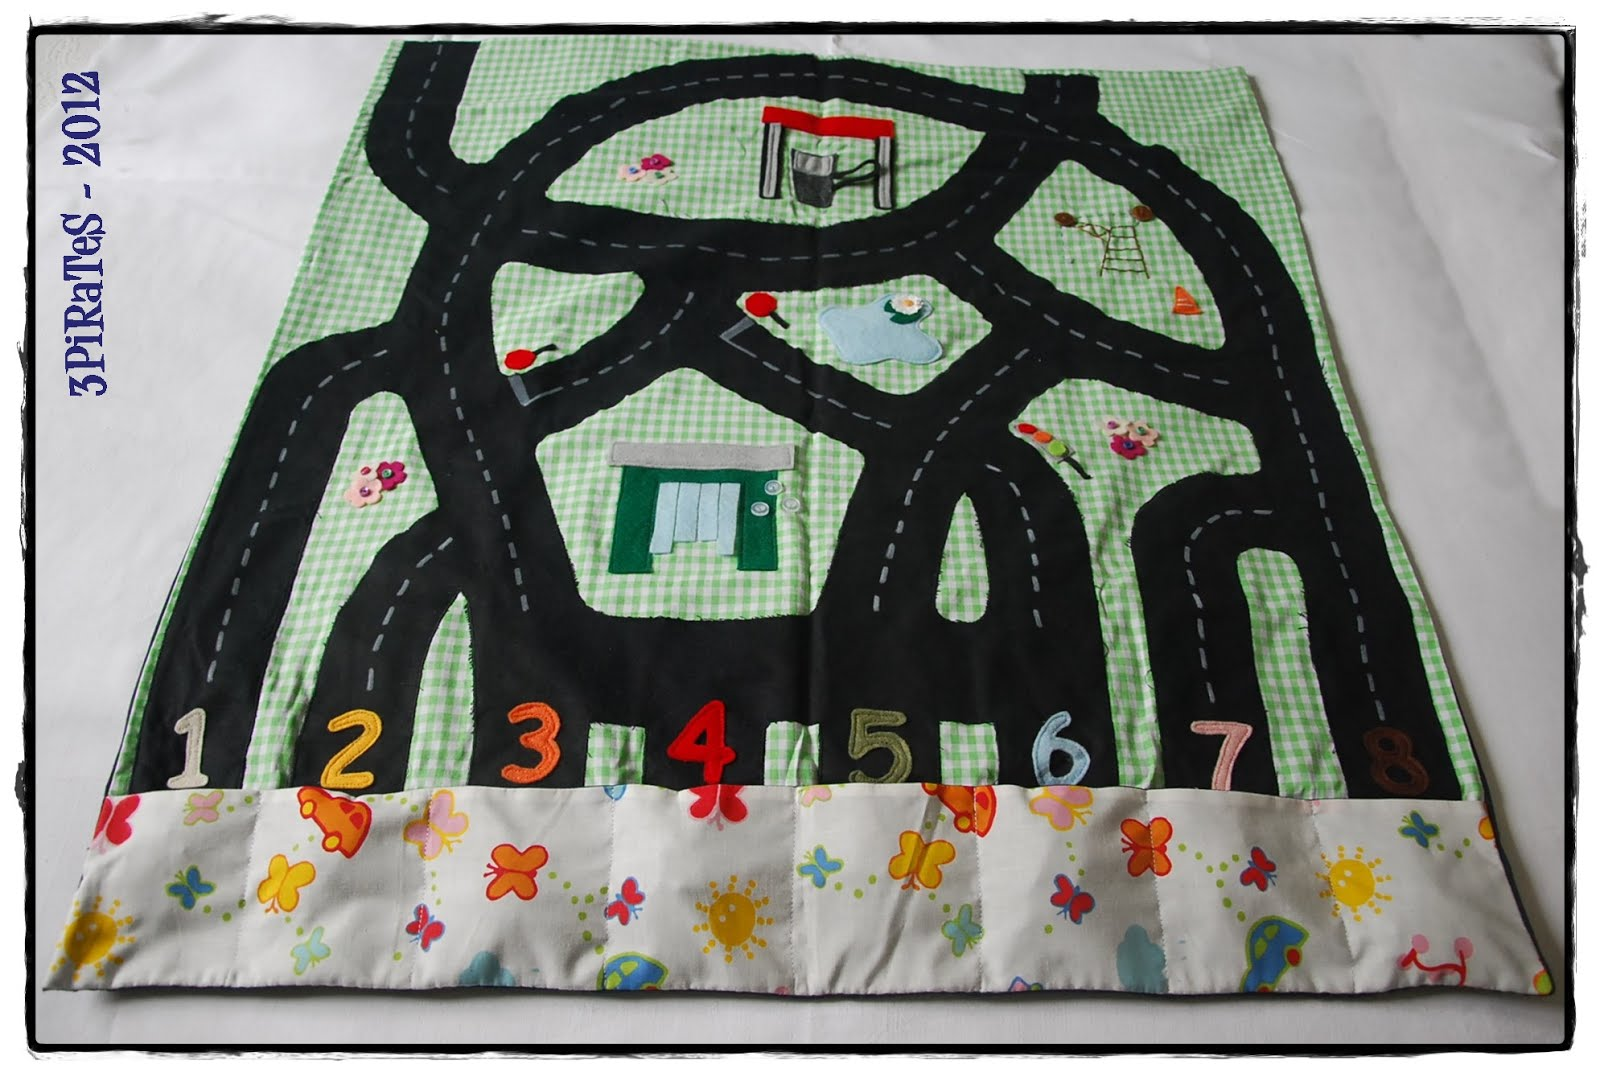 3pirates circuit nomade pour petites voitures. Black Bedroom Furniture Sets. Home Design Ideas